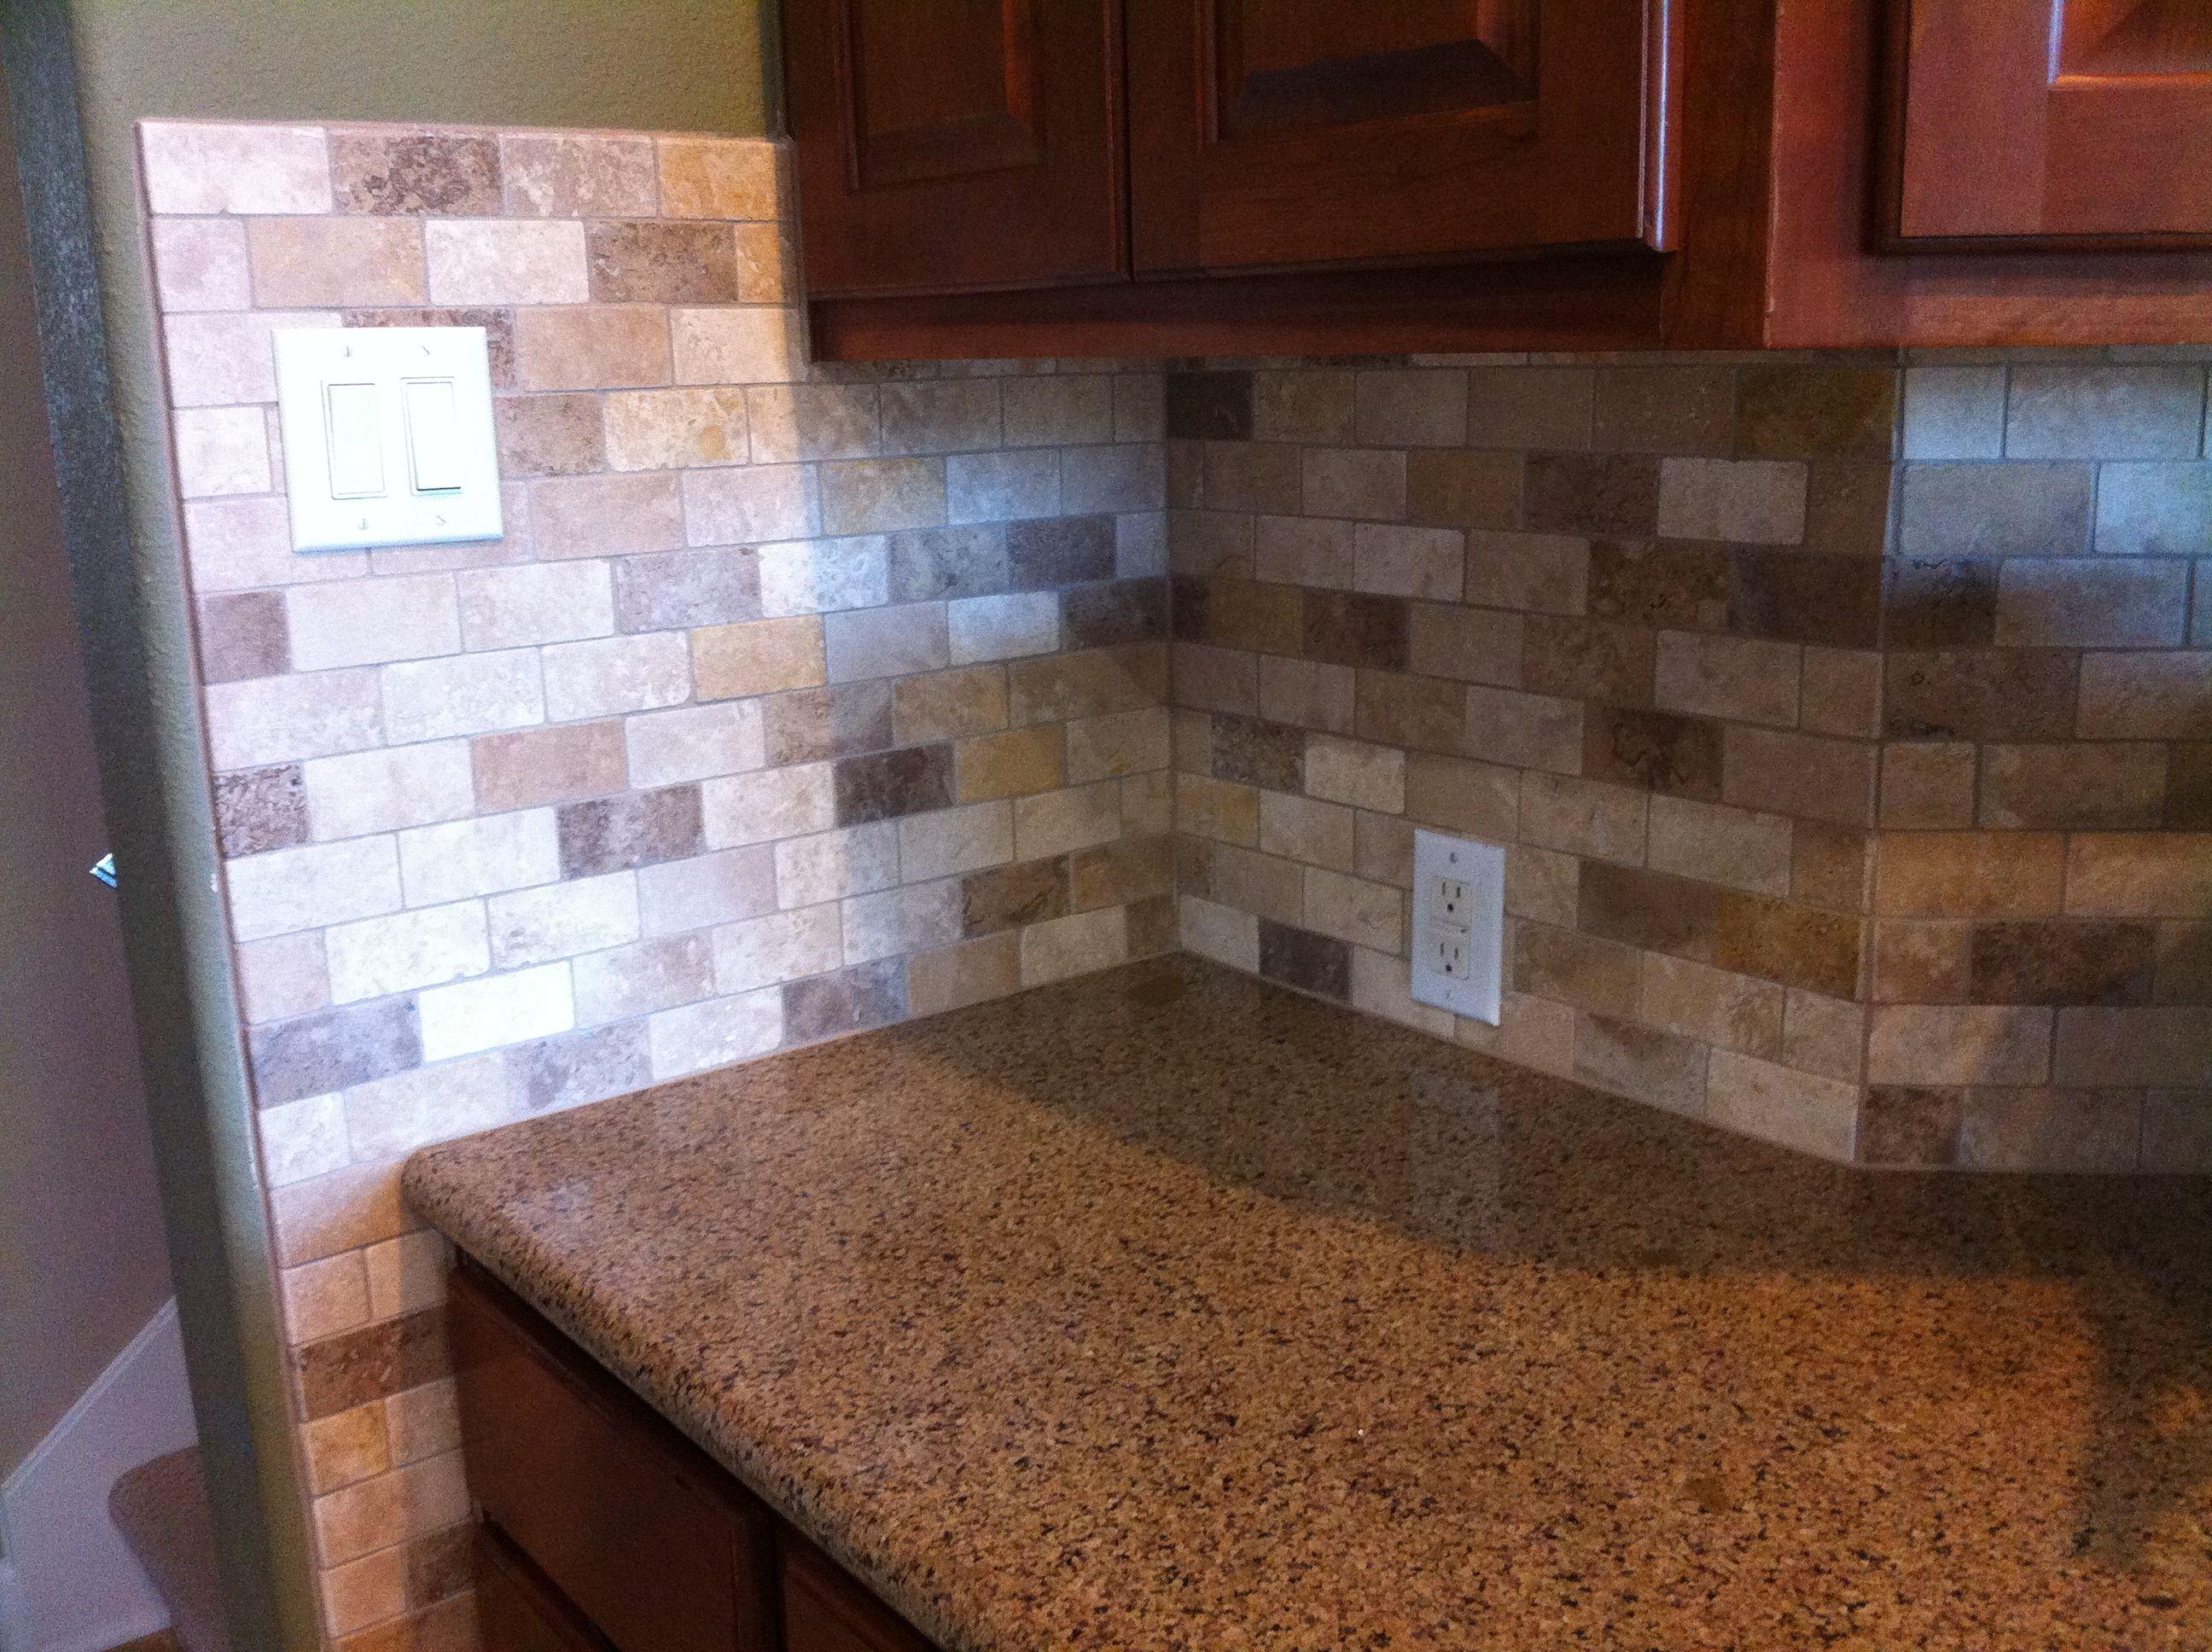 crosley kitchen islands unique designs multi-colored tumbled travertine backsplash tile.   tile ...